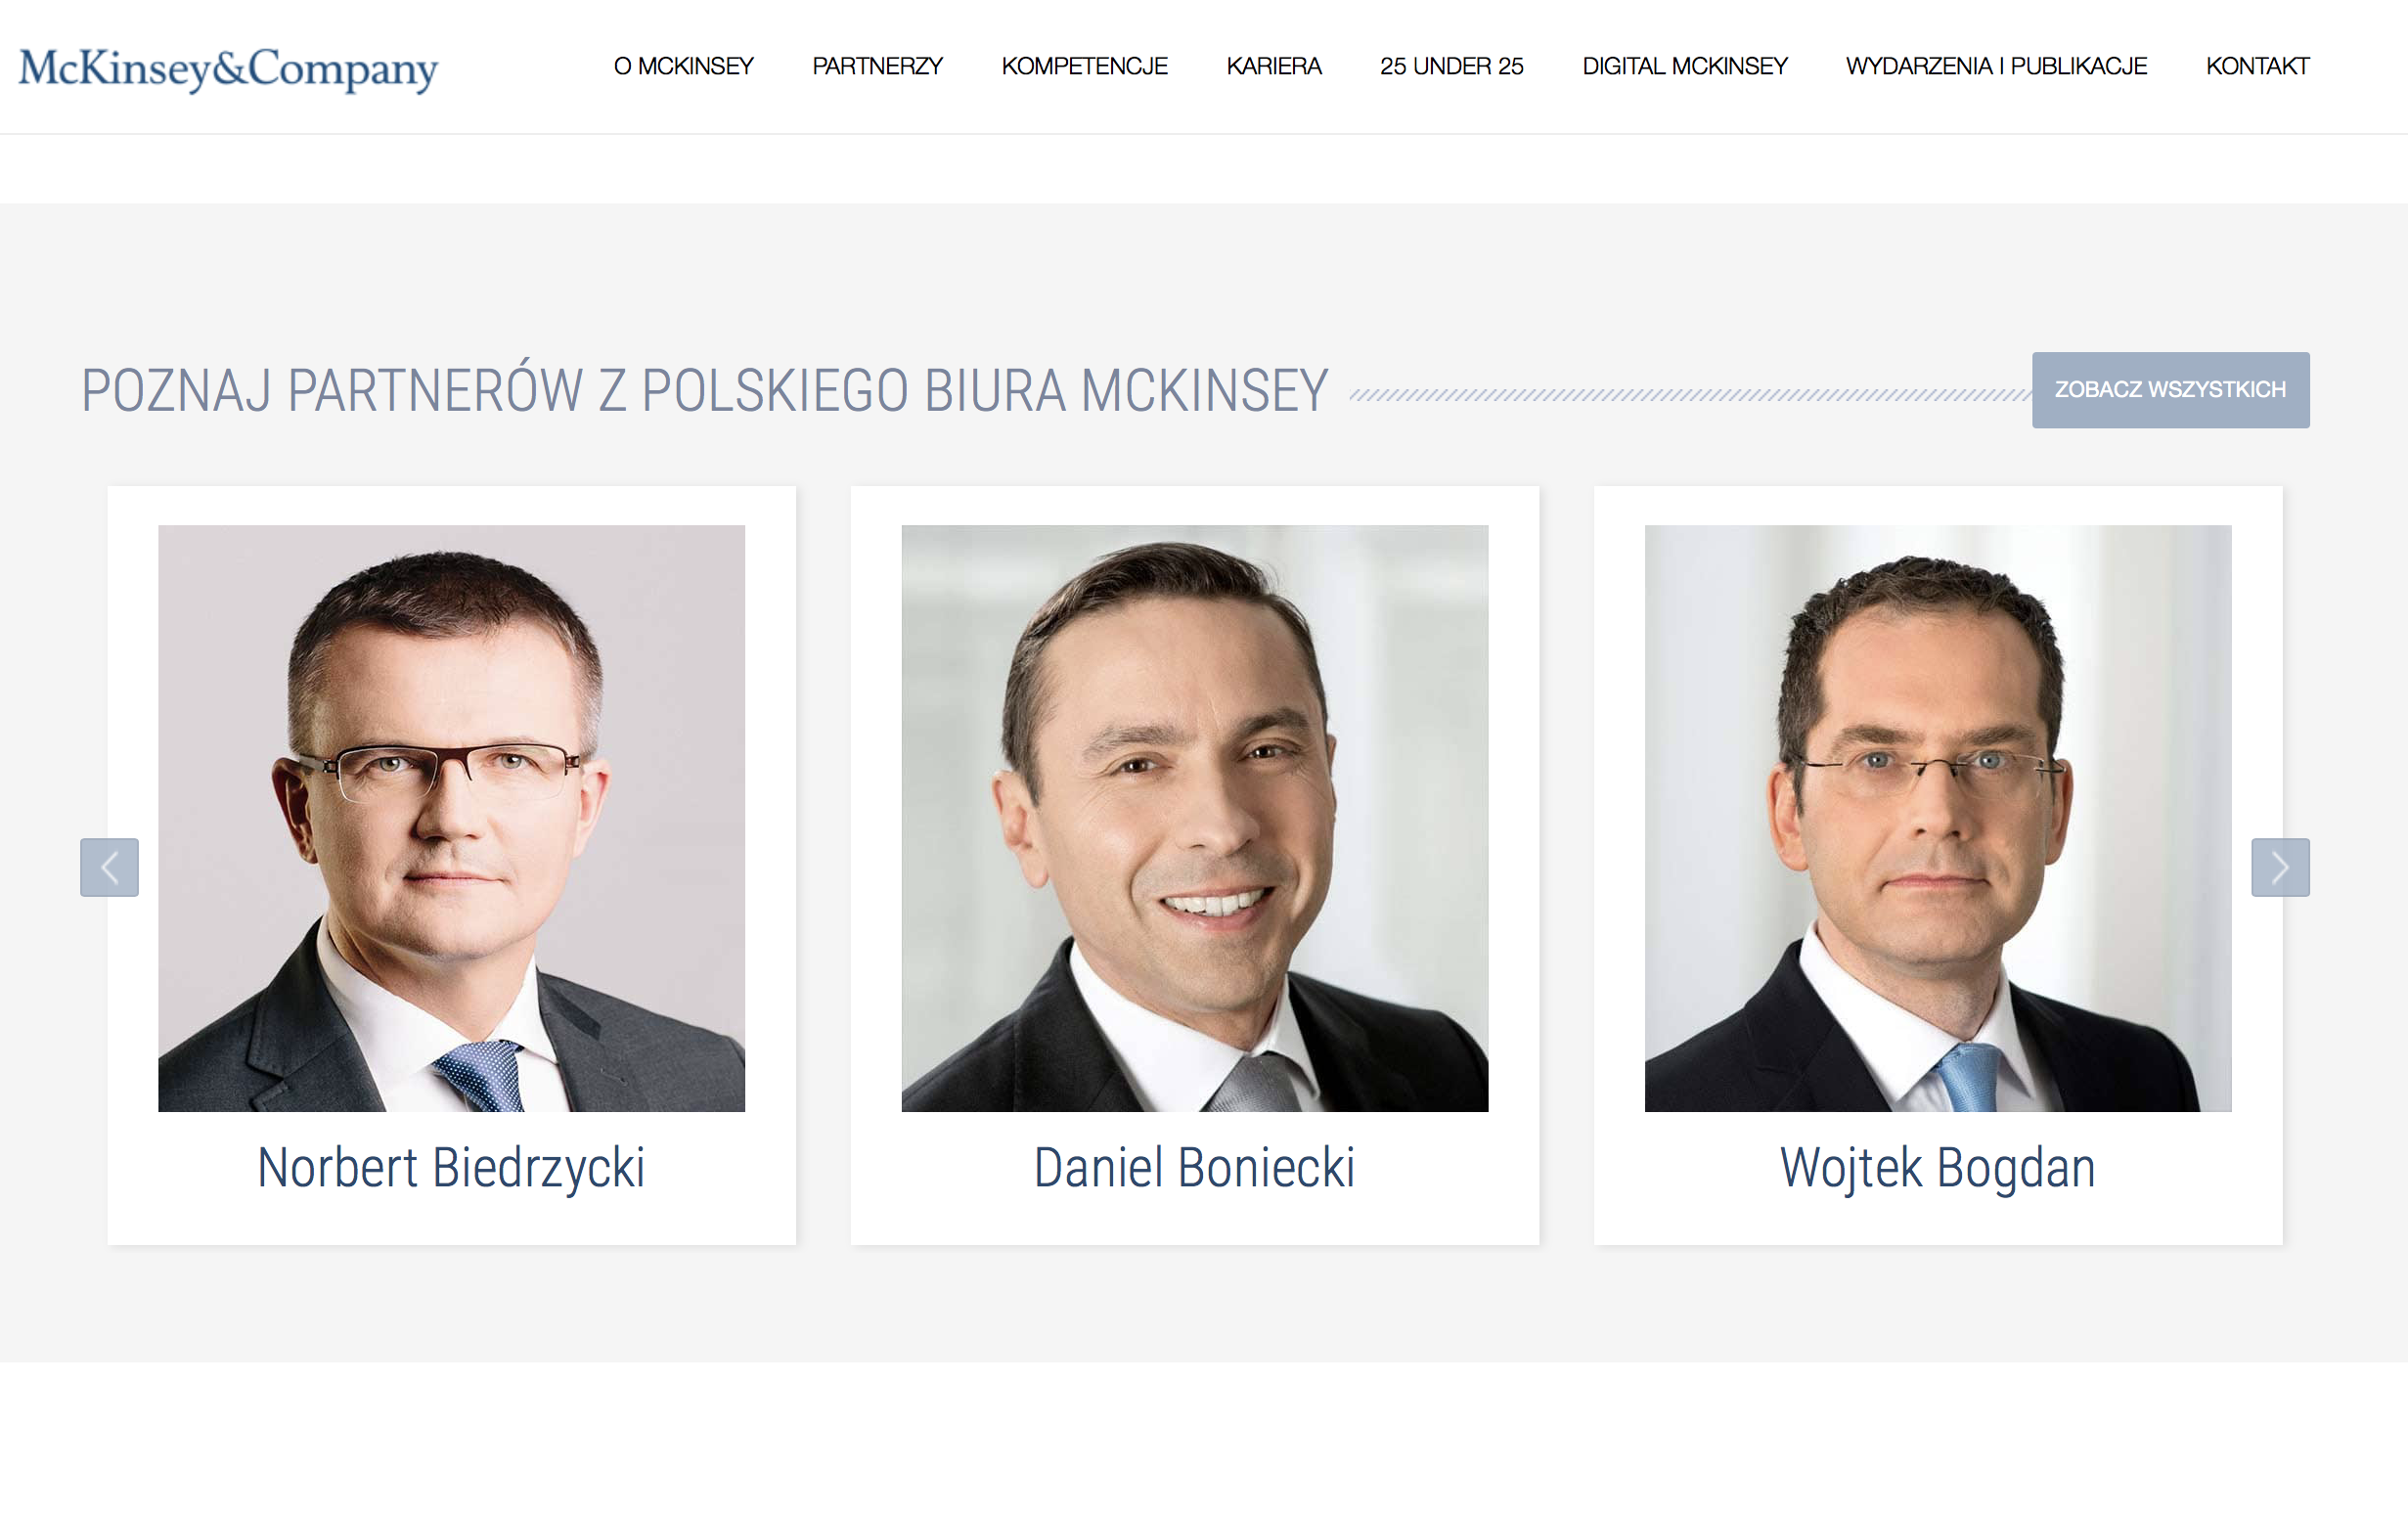 Norbert Biedrzycki McKinsey partners